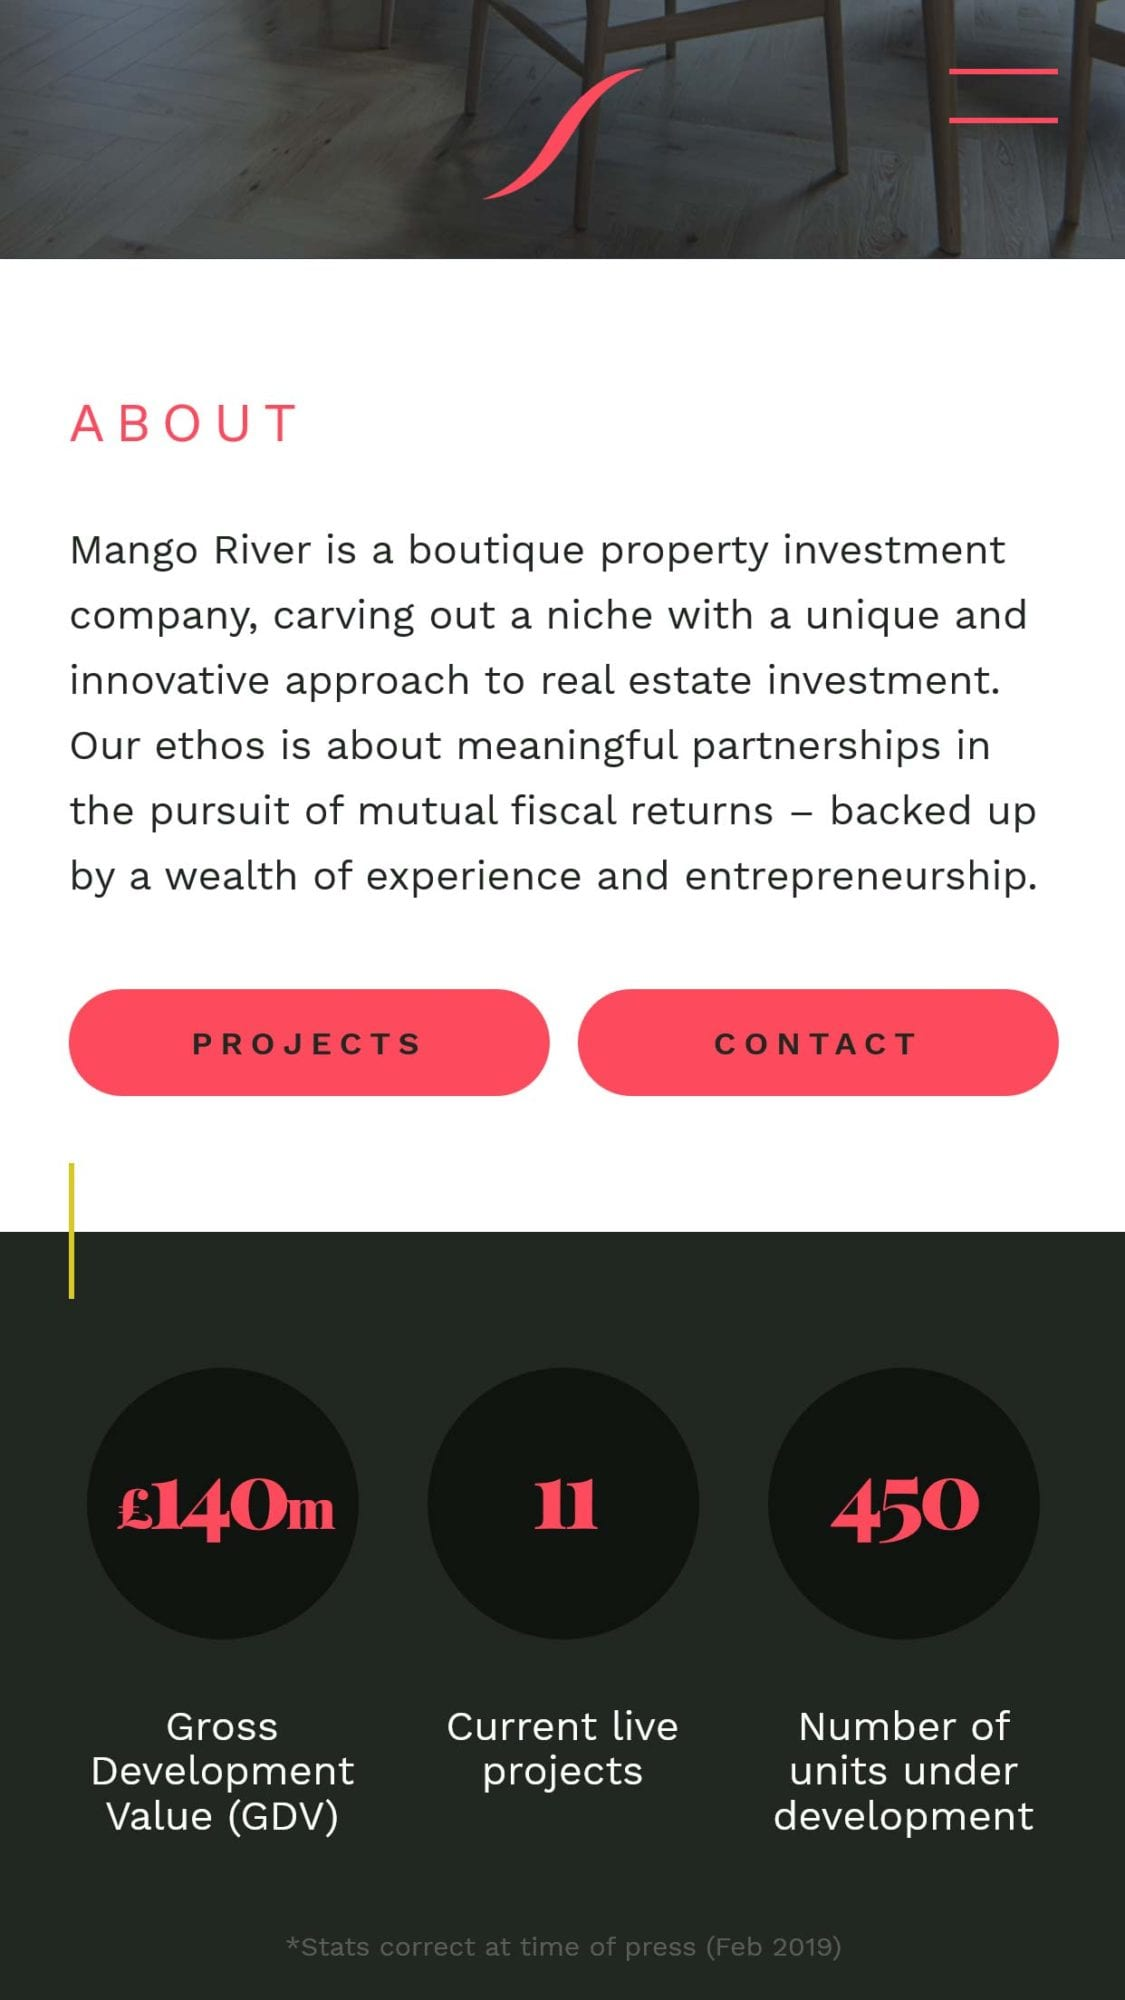 Mango River